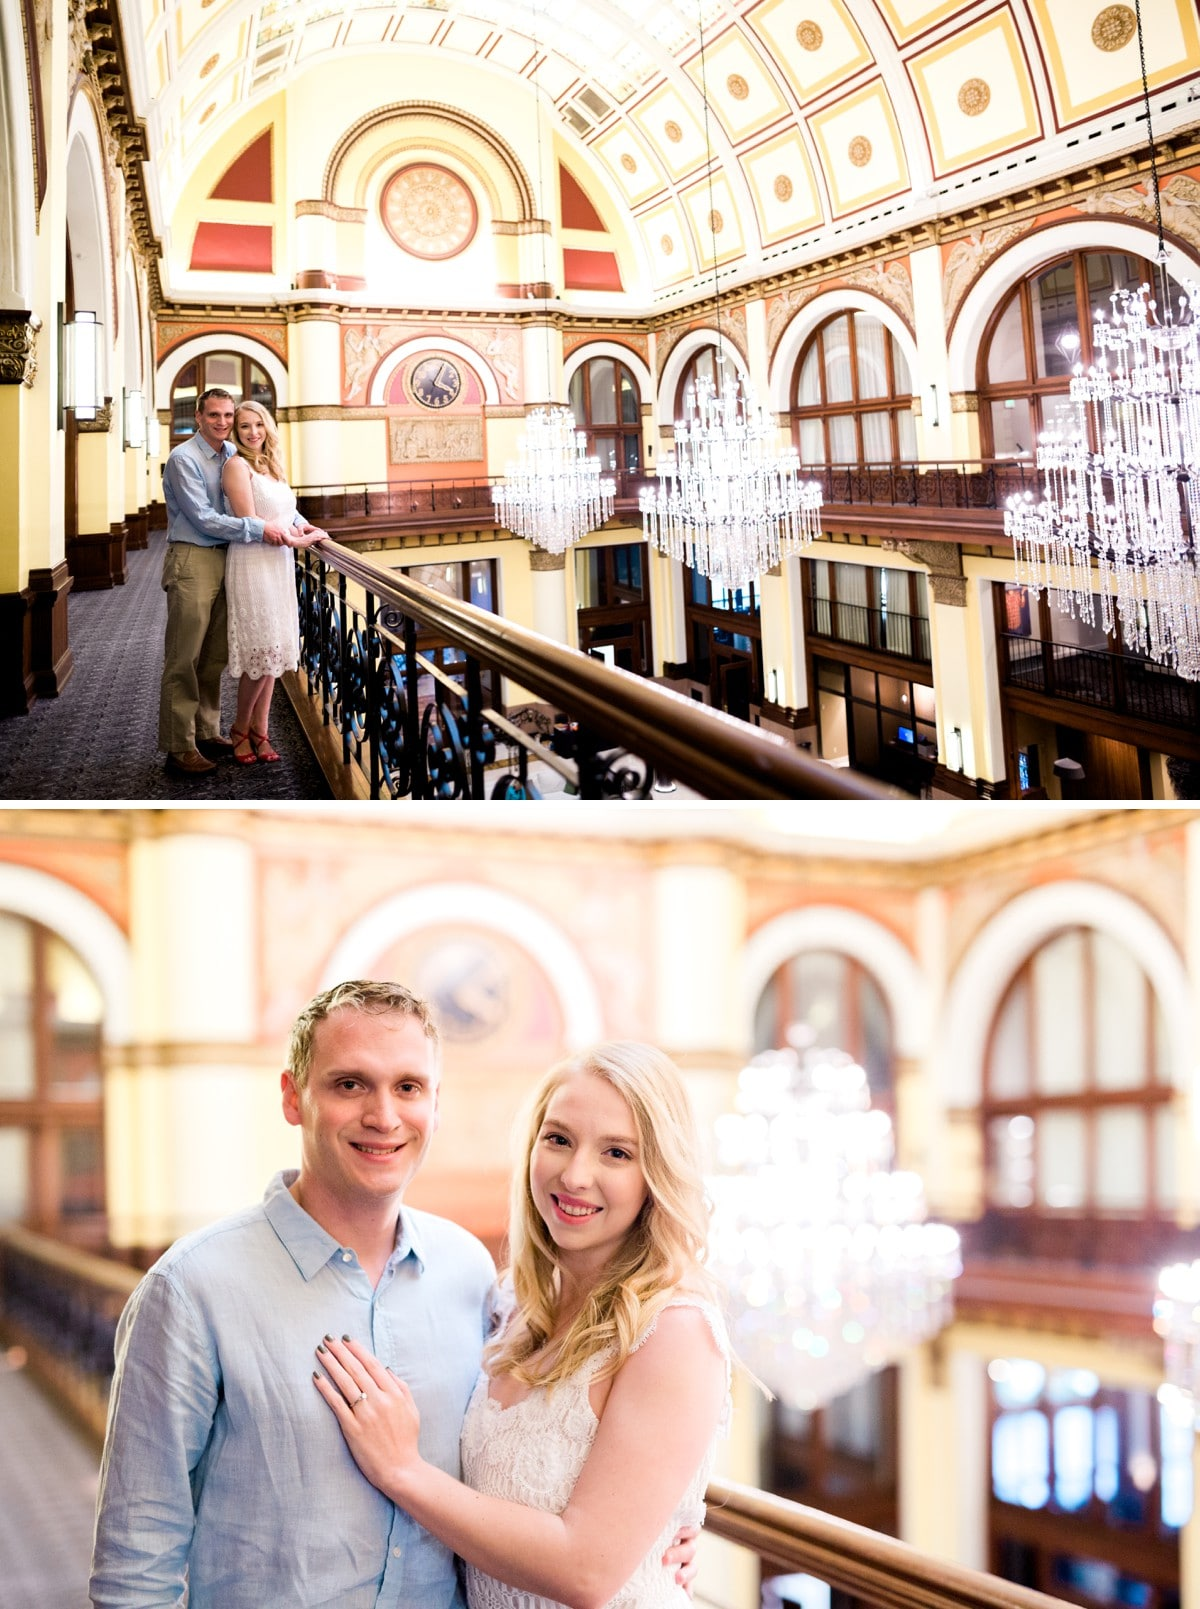 Nashville Engagement Session at Union Station Hotel